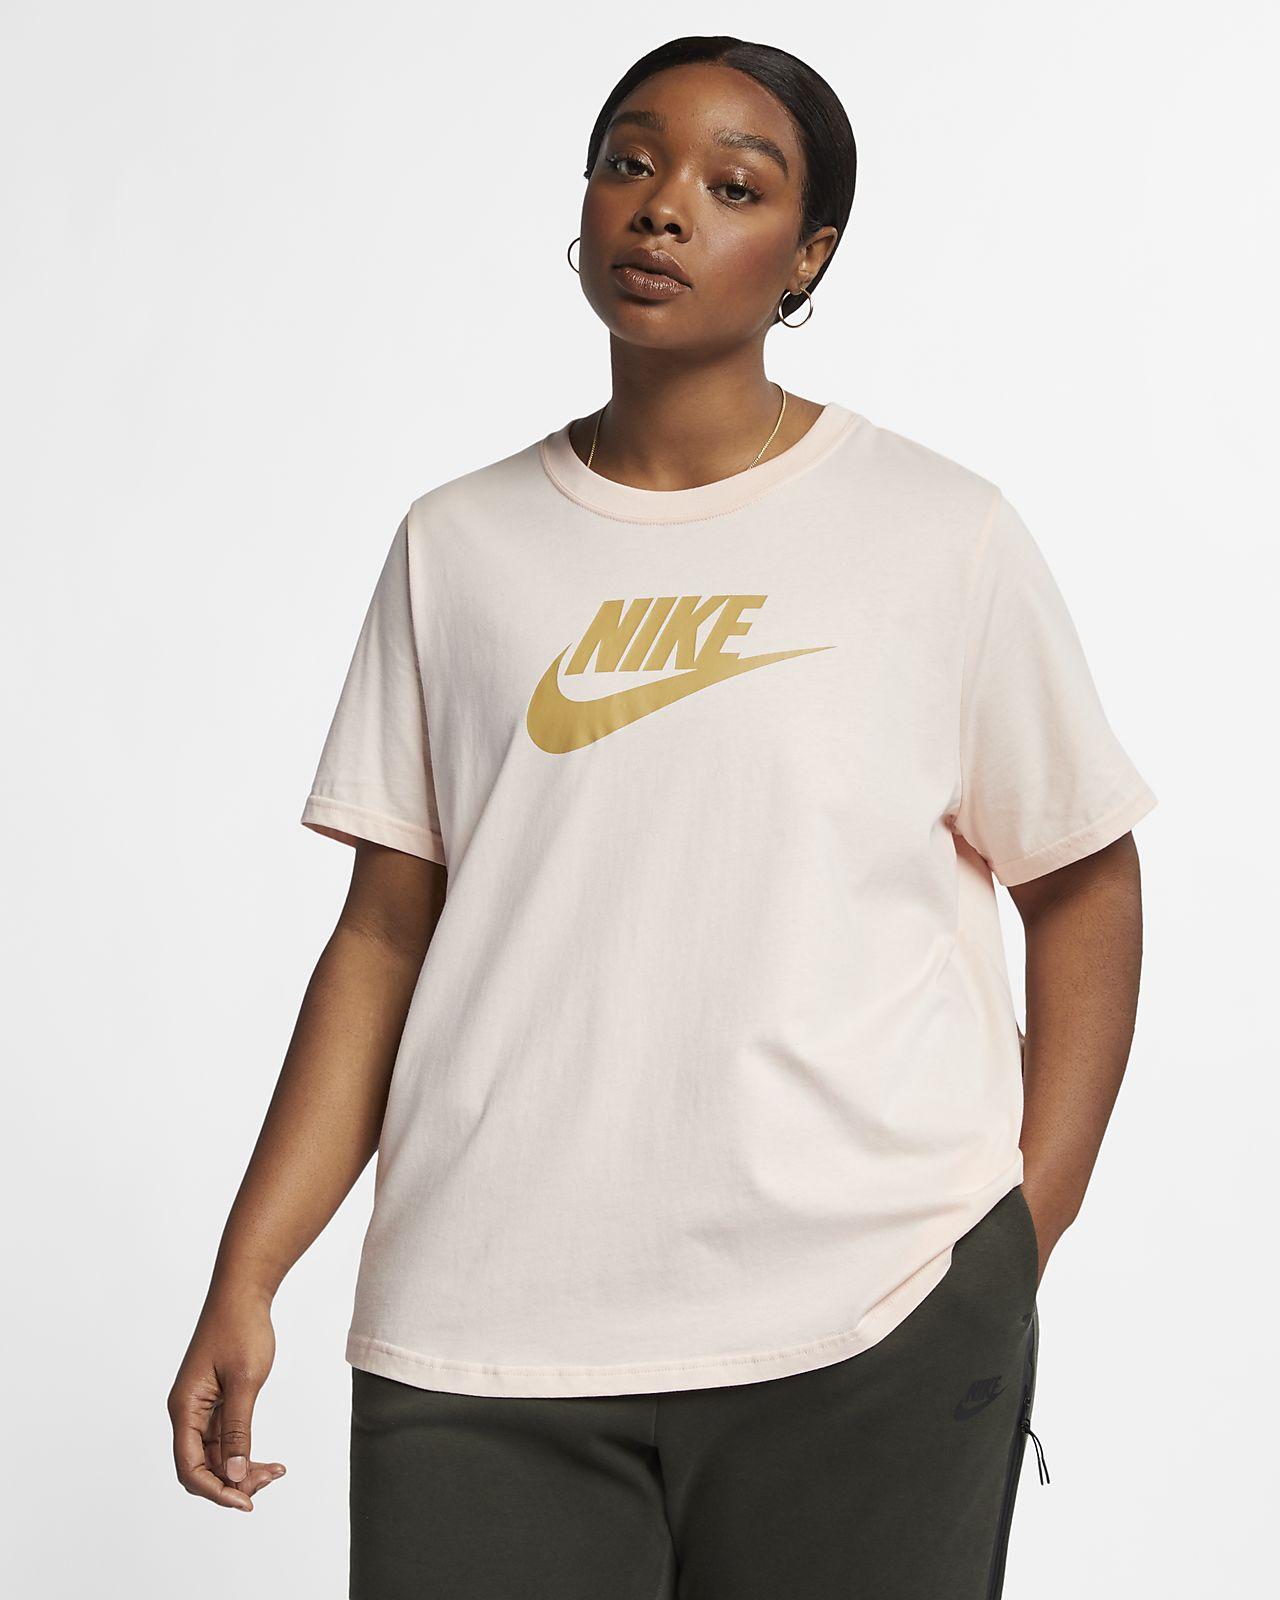 6204fcd43 Nike Sportswear Essential Women's T-Shirt (Plus Size). Nike.com SE